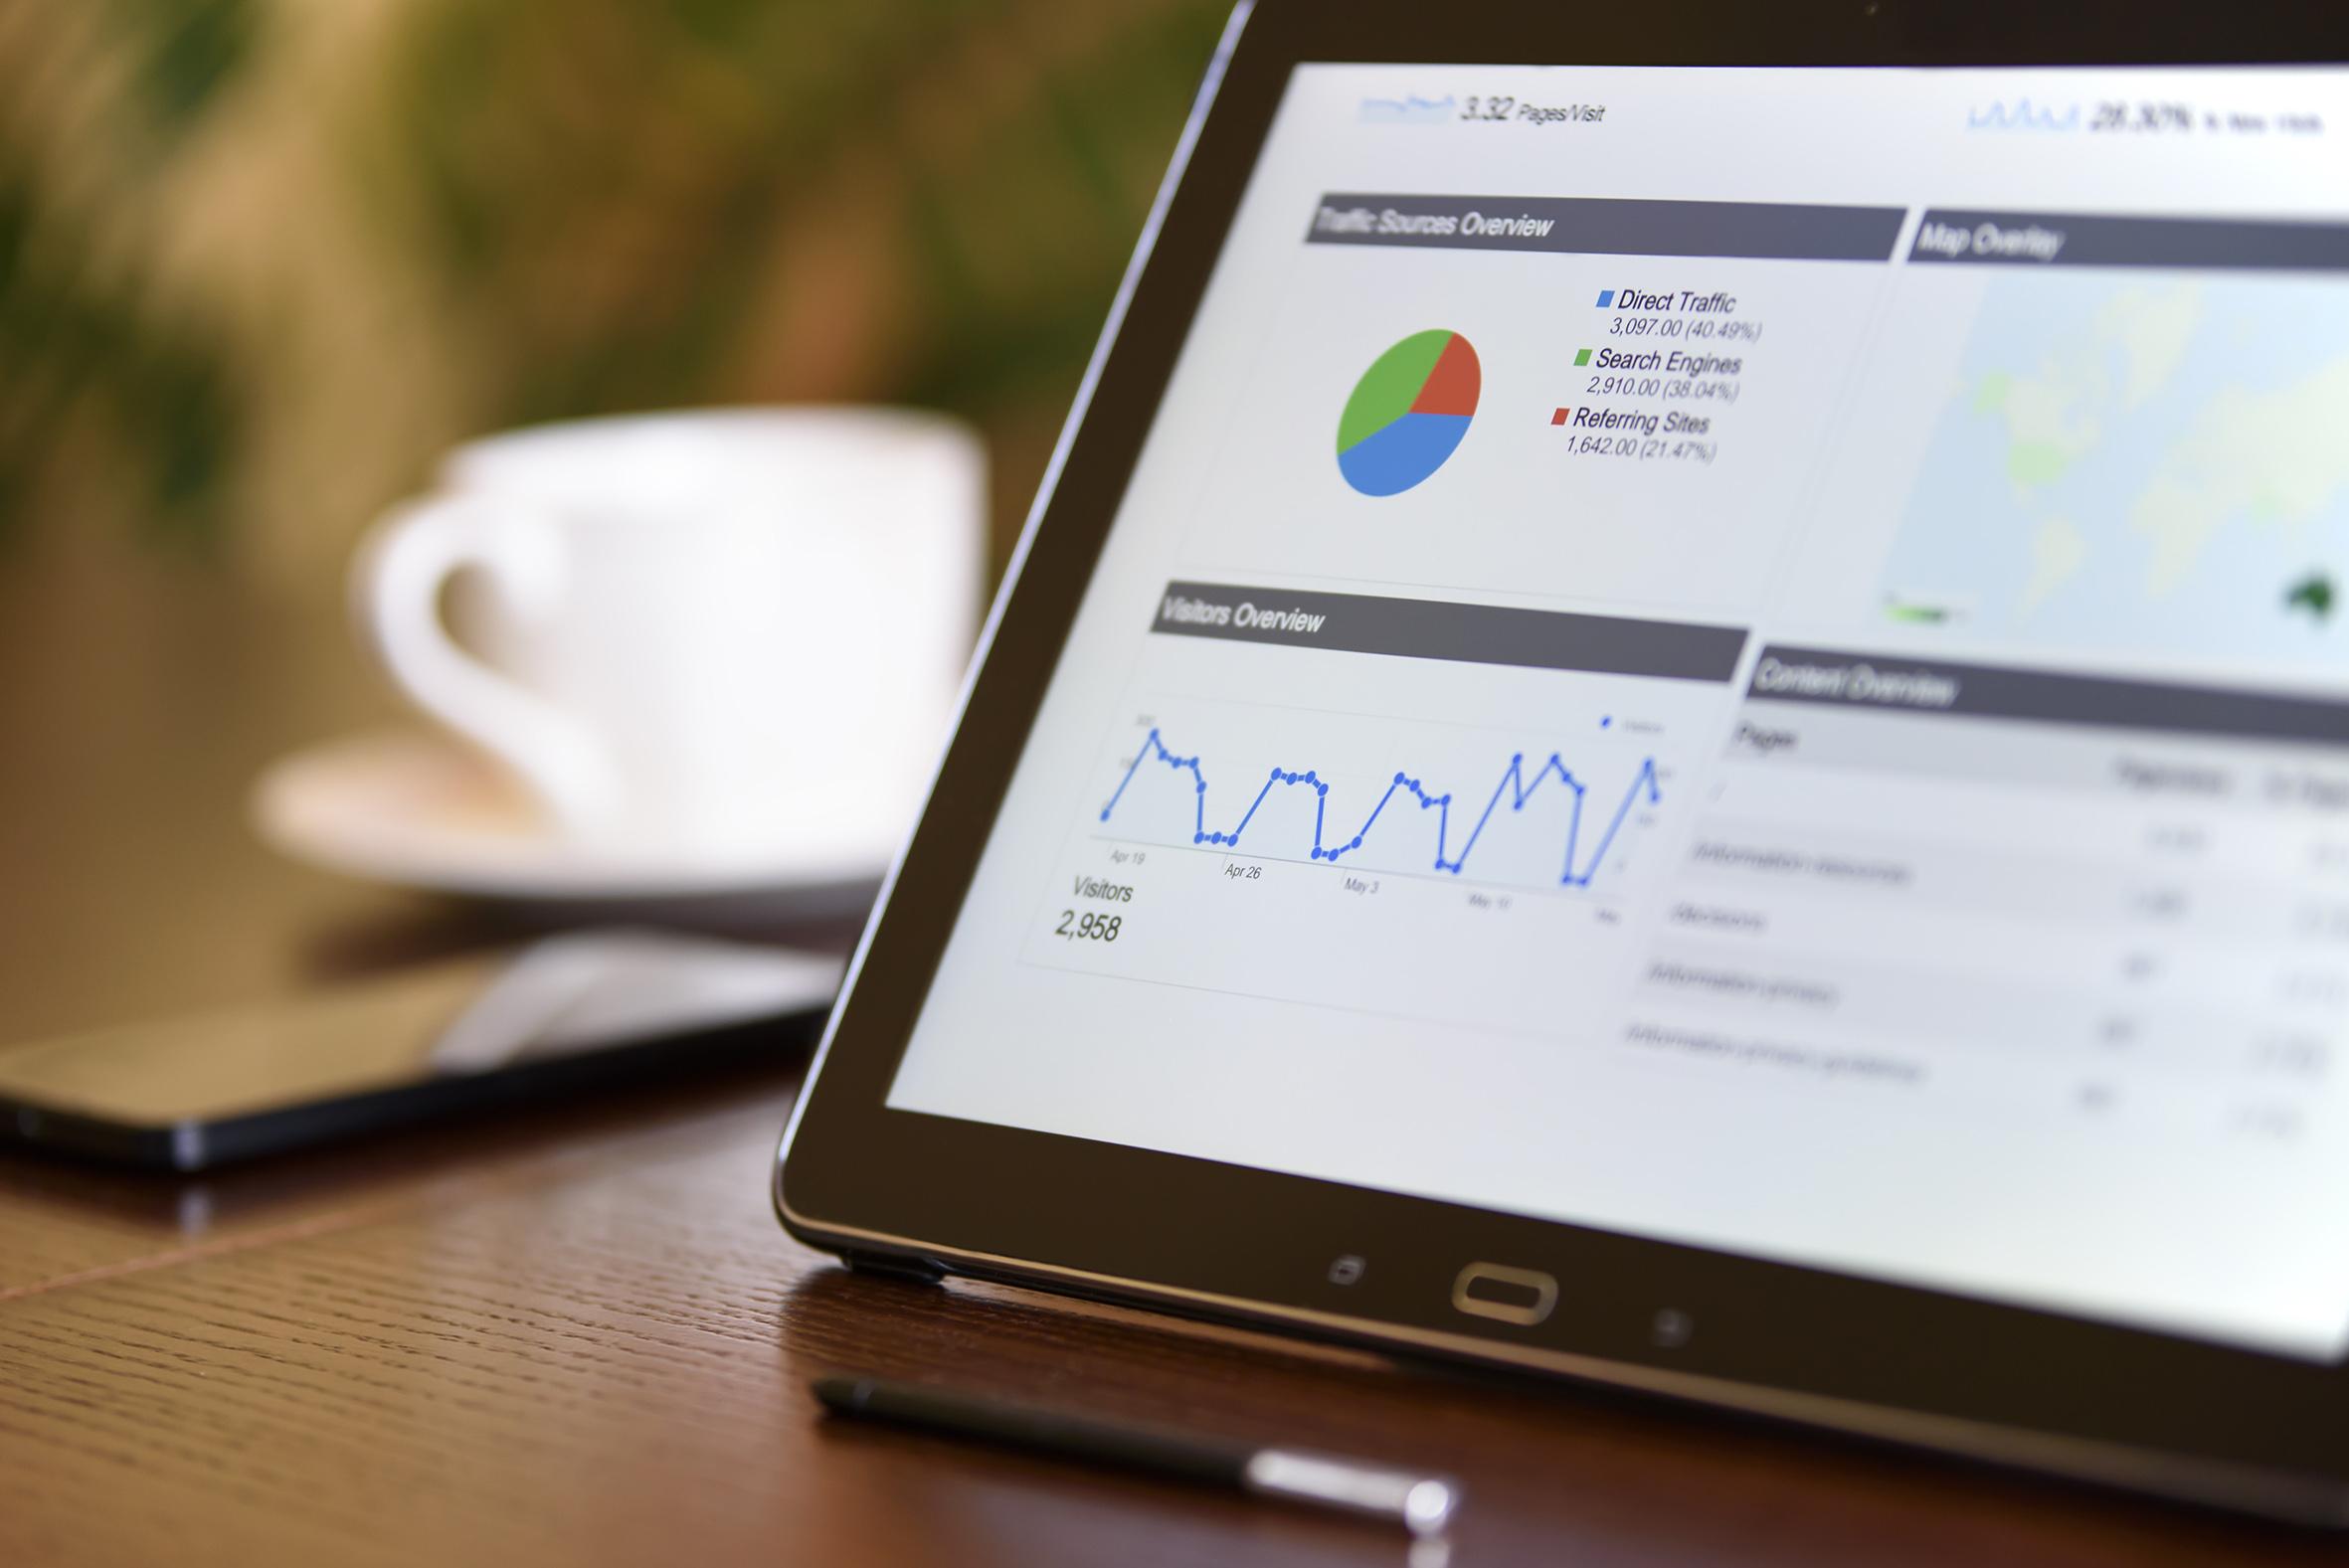 комплексная seo-оптимизация сайта, seo продвижение, сео оптимизация, сео продвижение, заказать продвижение сайта, продвижение Яндекс, продвижение гугл, seo стоимость, seo цены, сео цены, сео стоимость